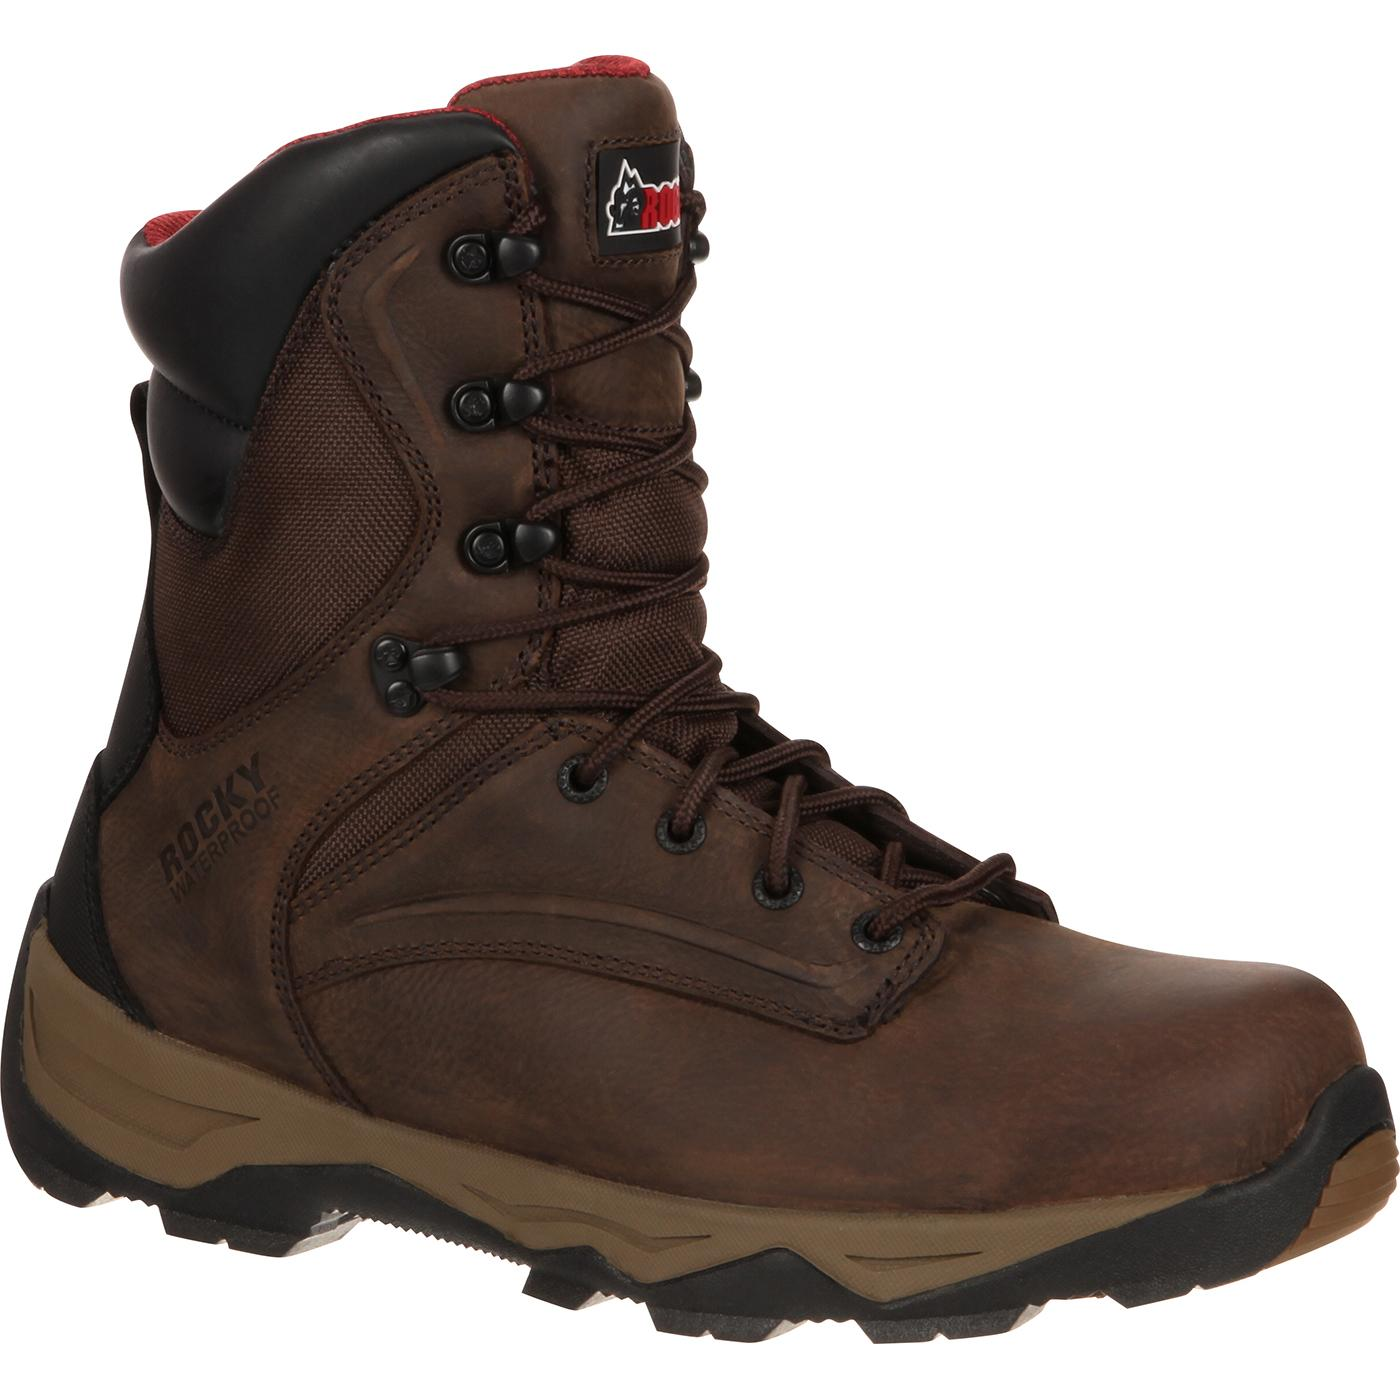 Rocky Retraction Steel Toe Waterproof Work Boot, , large